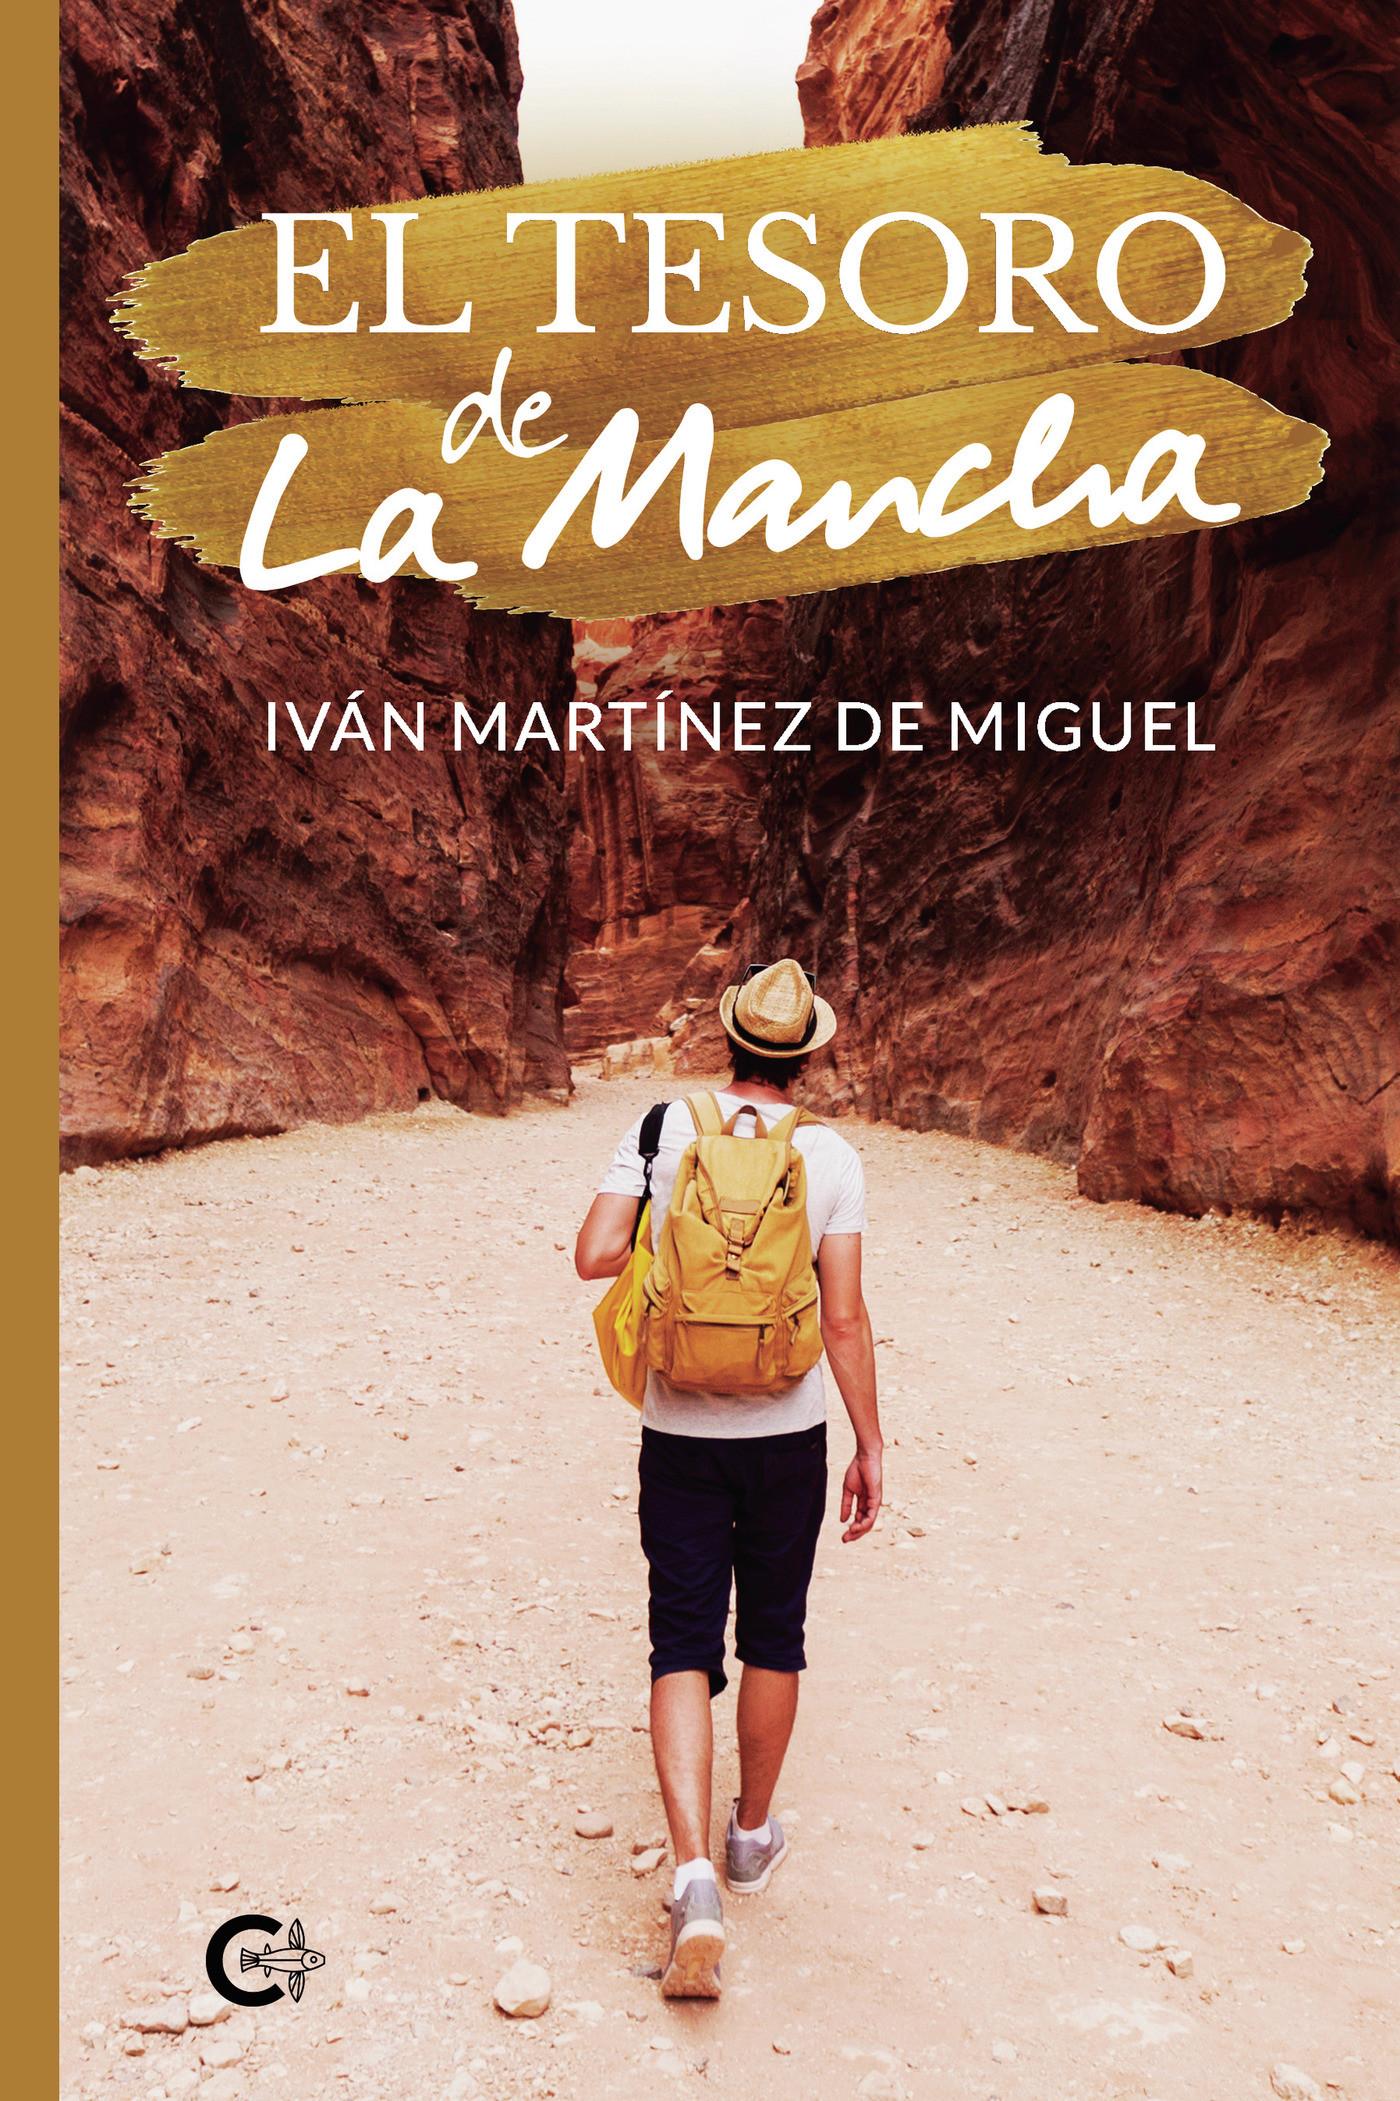 El tesoro de La Mancha